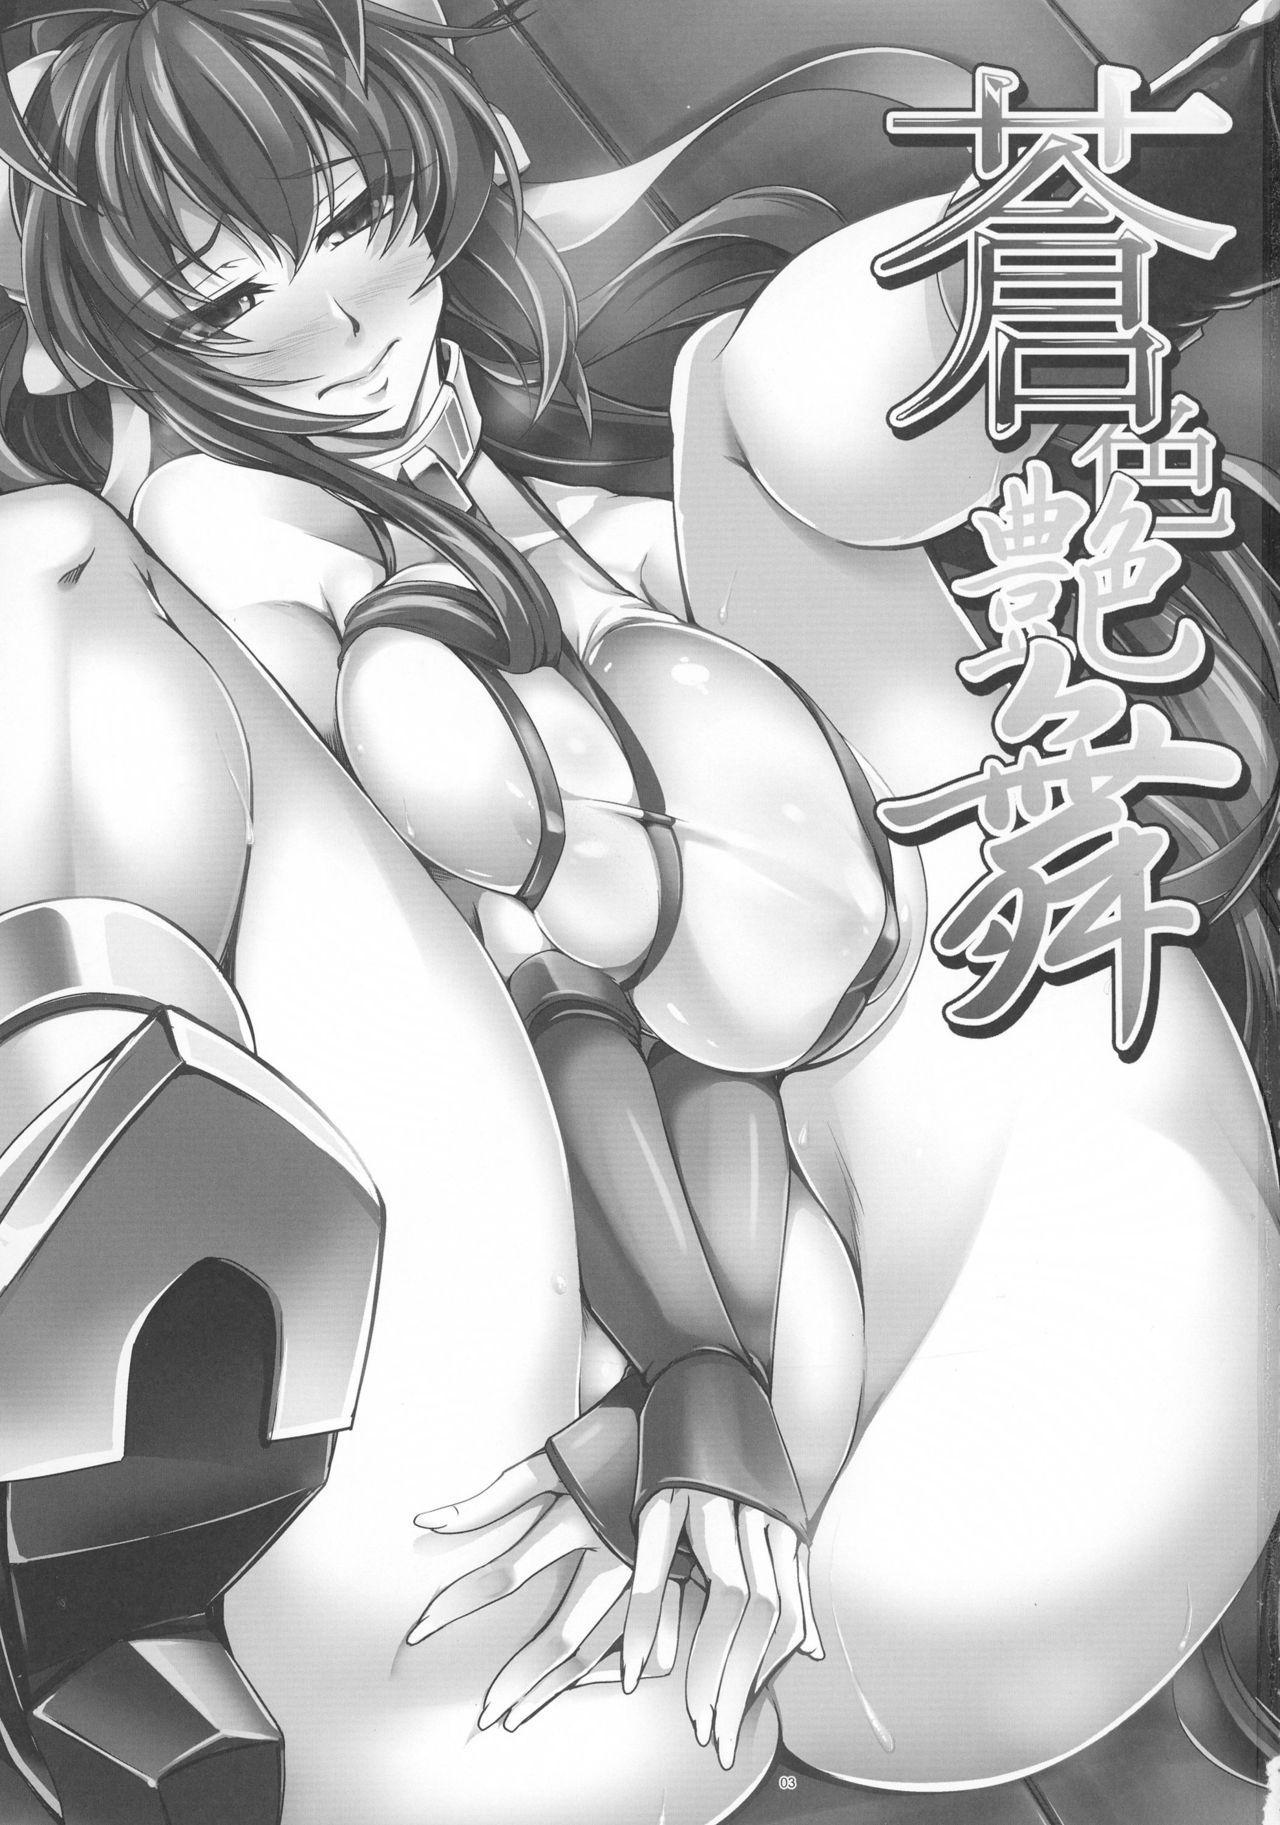 (C91) [Kanten Jigenryuu (Kanten)] Aoiro Enbu (BLAZBLUE)[Chinese]【不可视汉化】 3